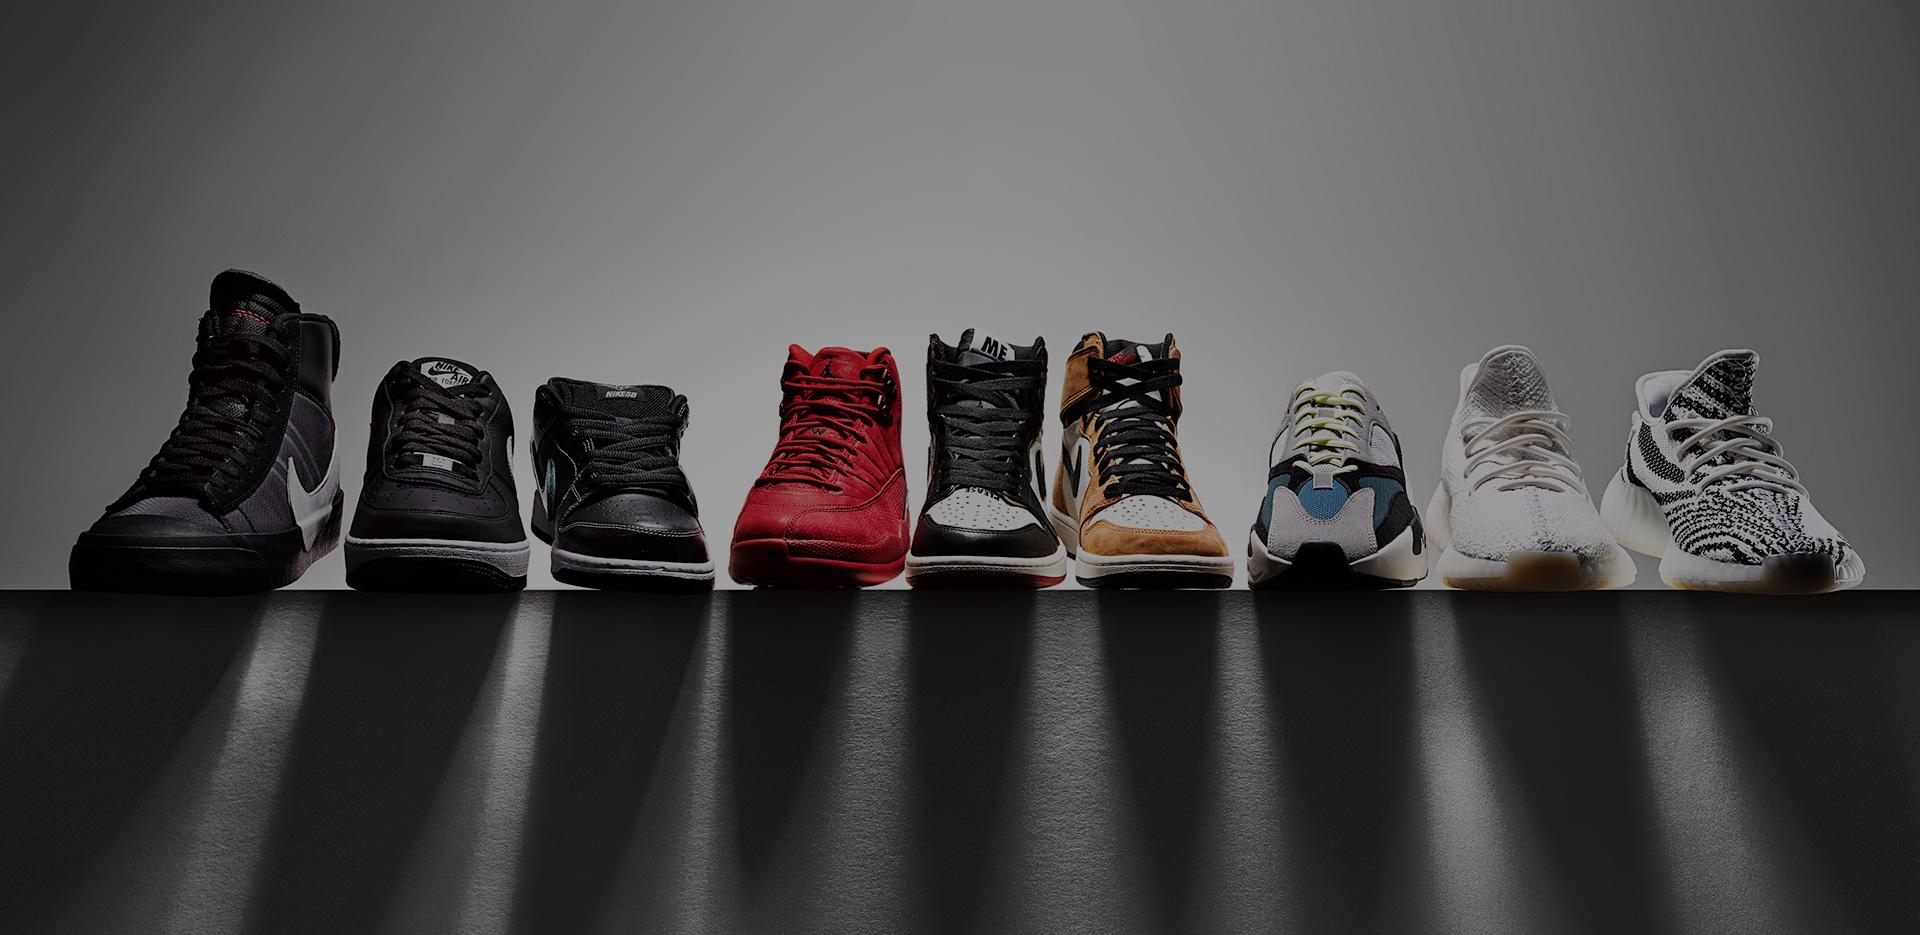 197b8fe3ec0abb The Definitive HOLIDAY SNEAKER Shopping Guide - SneakerNews.com